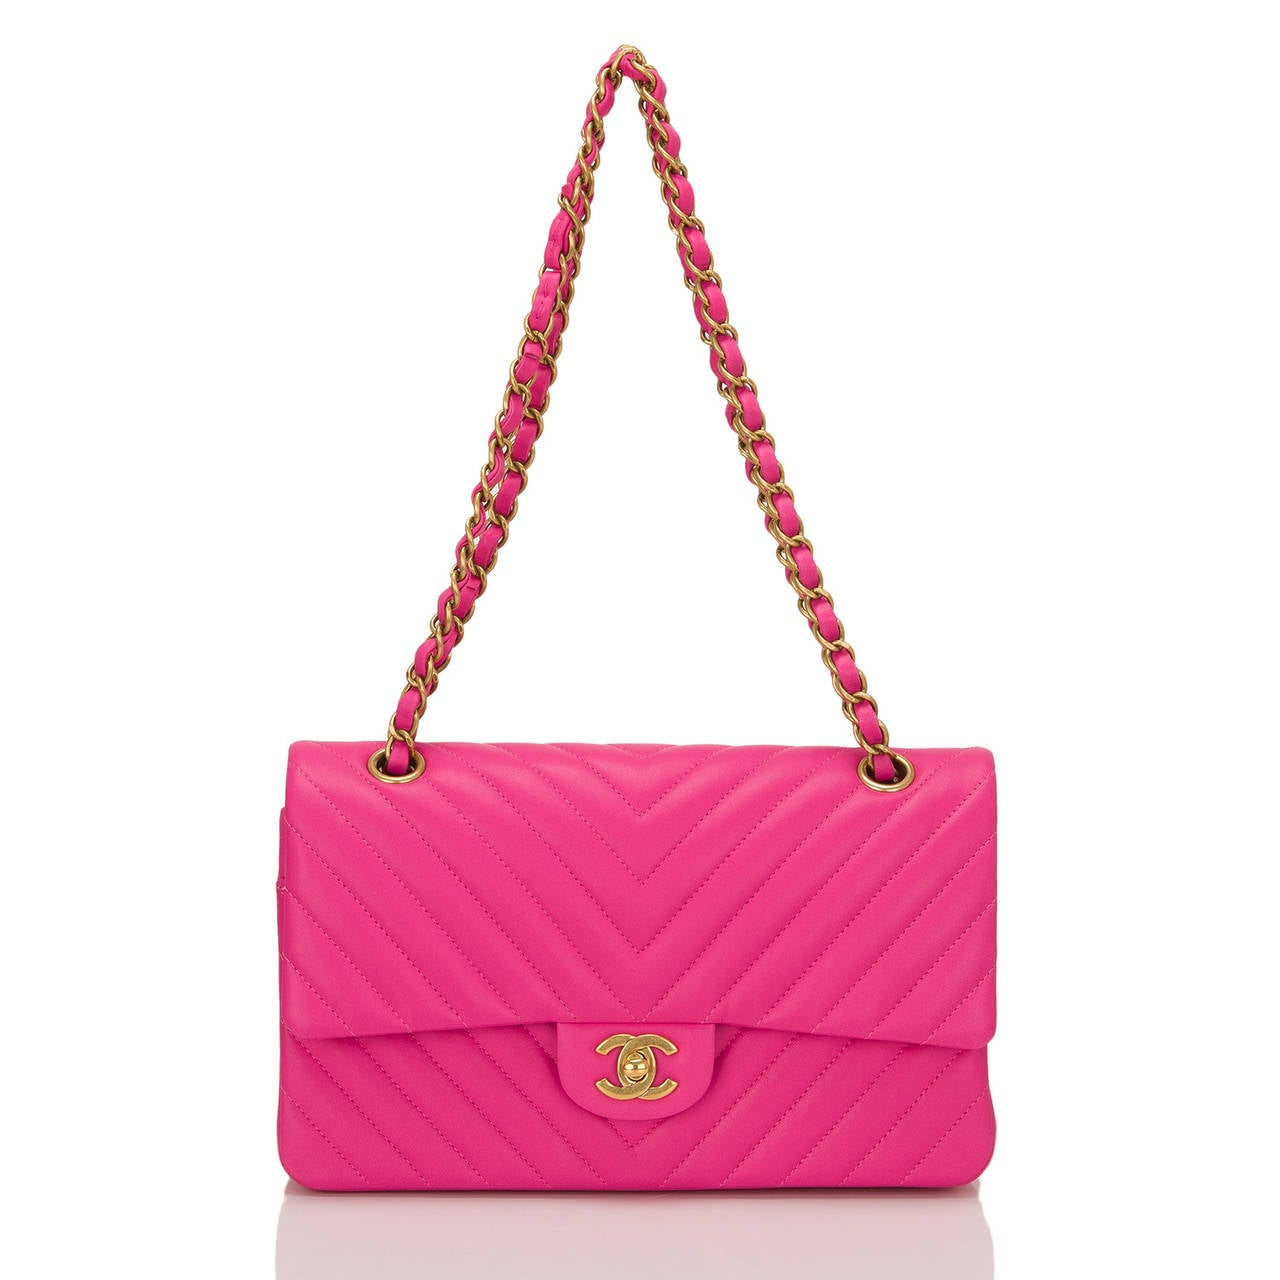 Women's Chanel Fuchsia Chevron Medium Classic Double Flap Bag For Sale